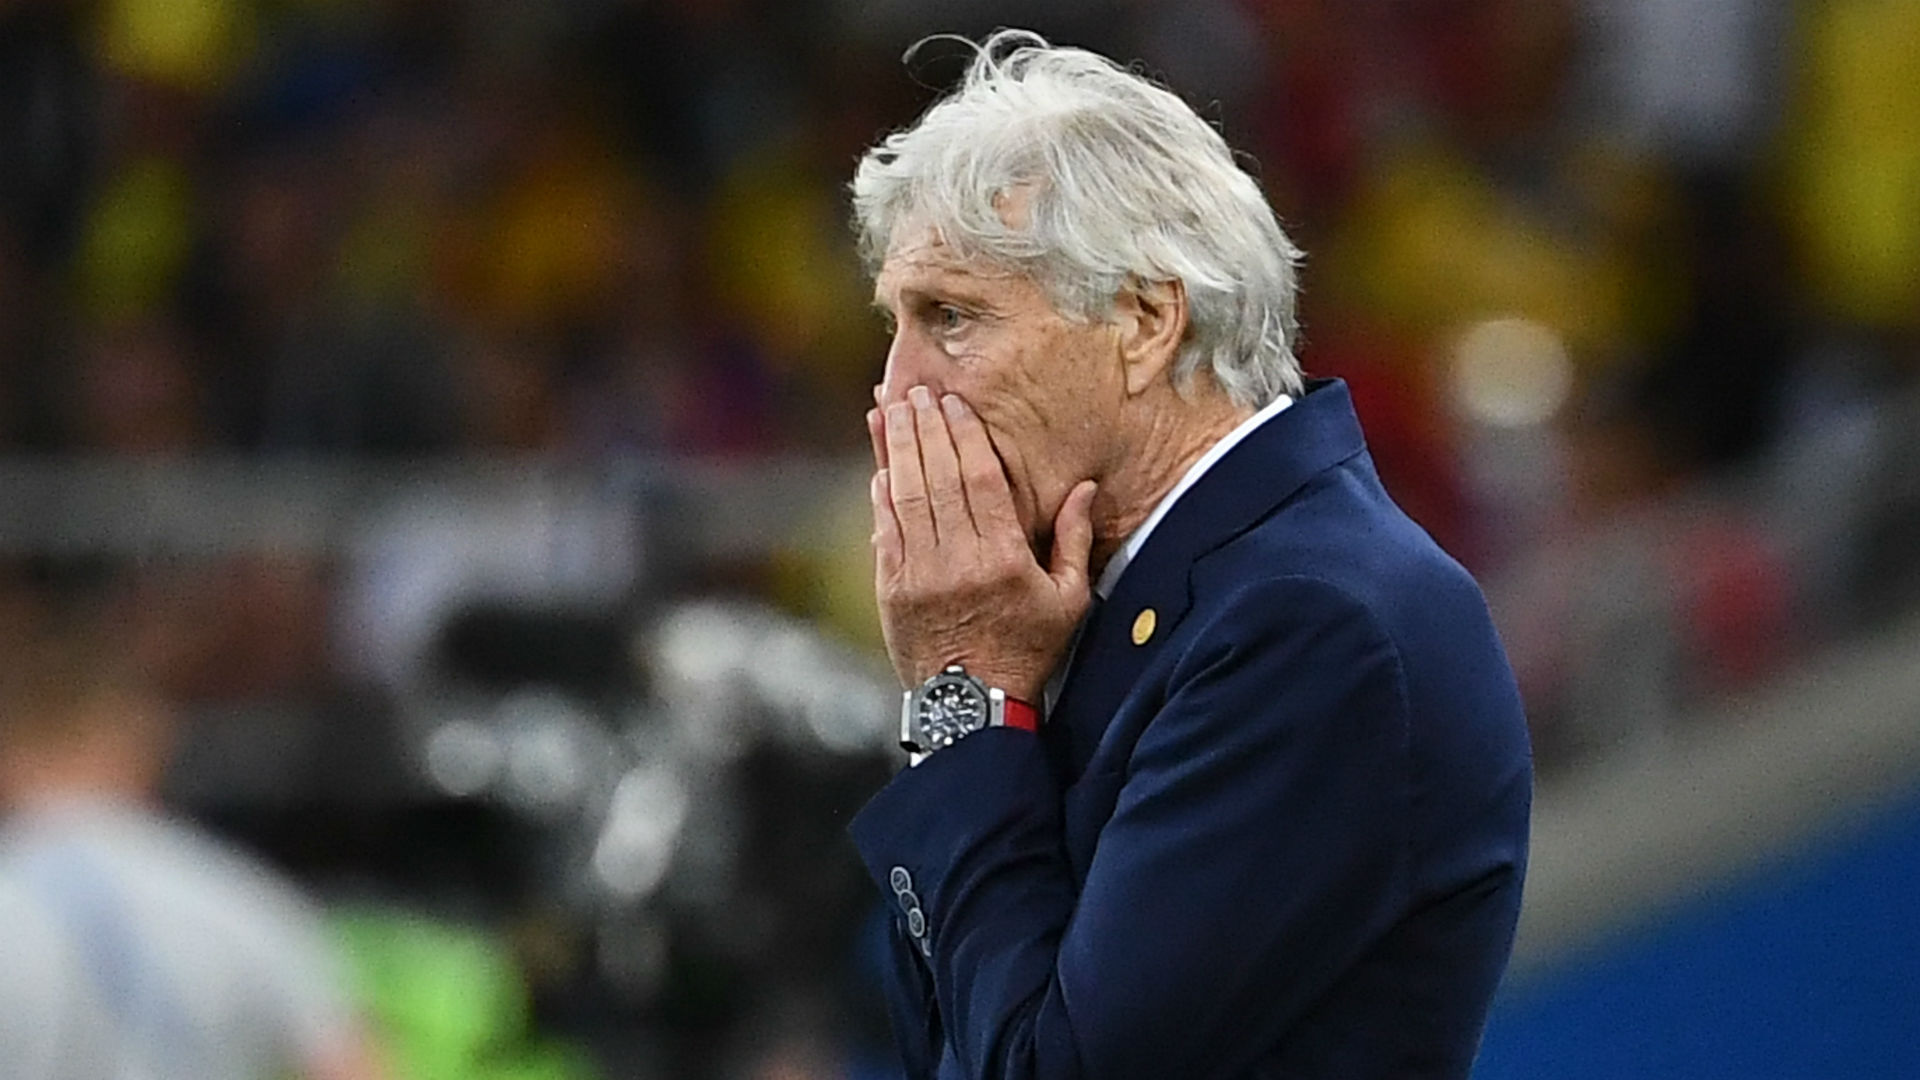 Jose Pekerman Colombia England World Cup 2018